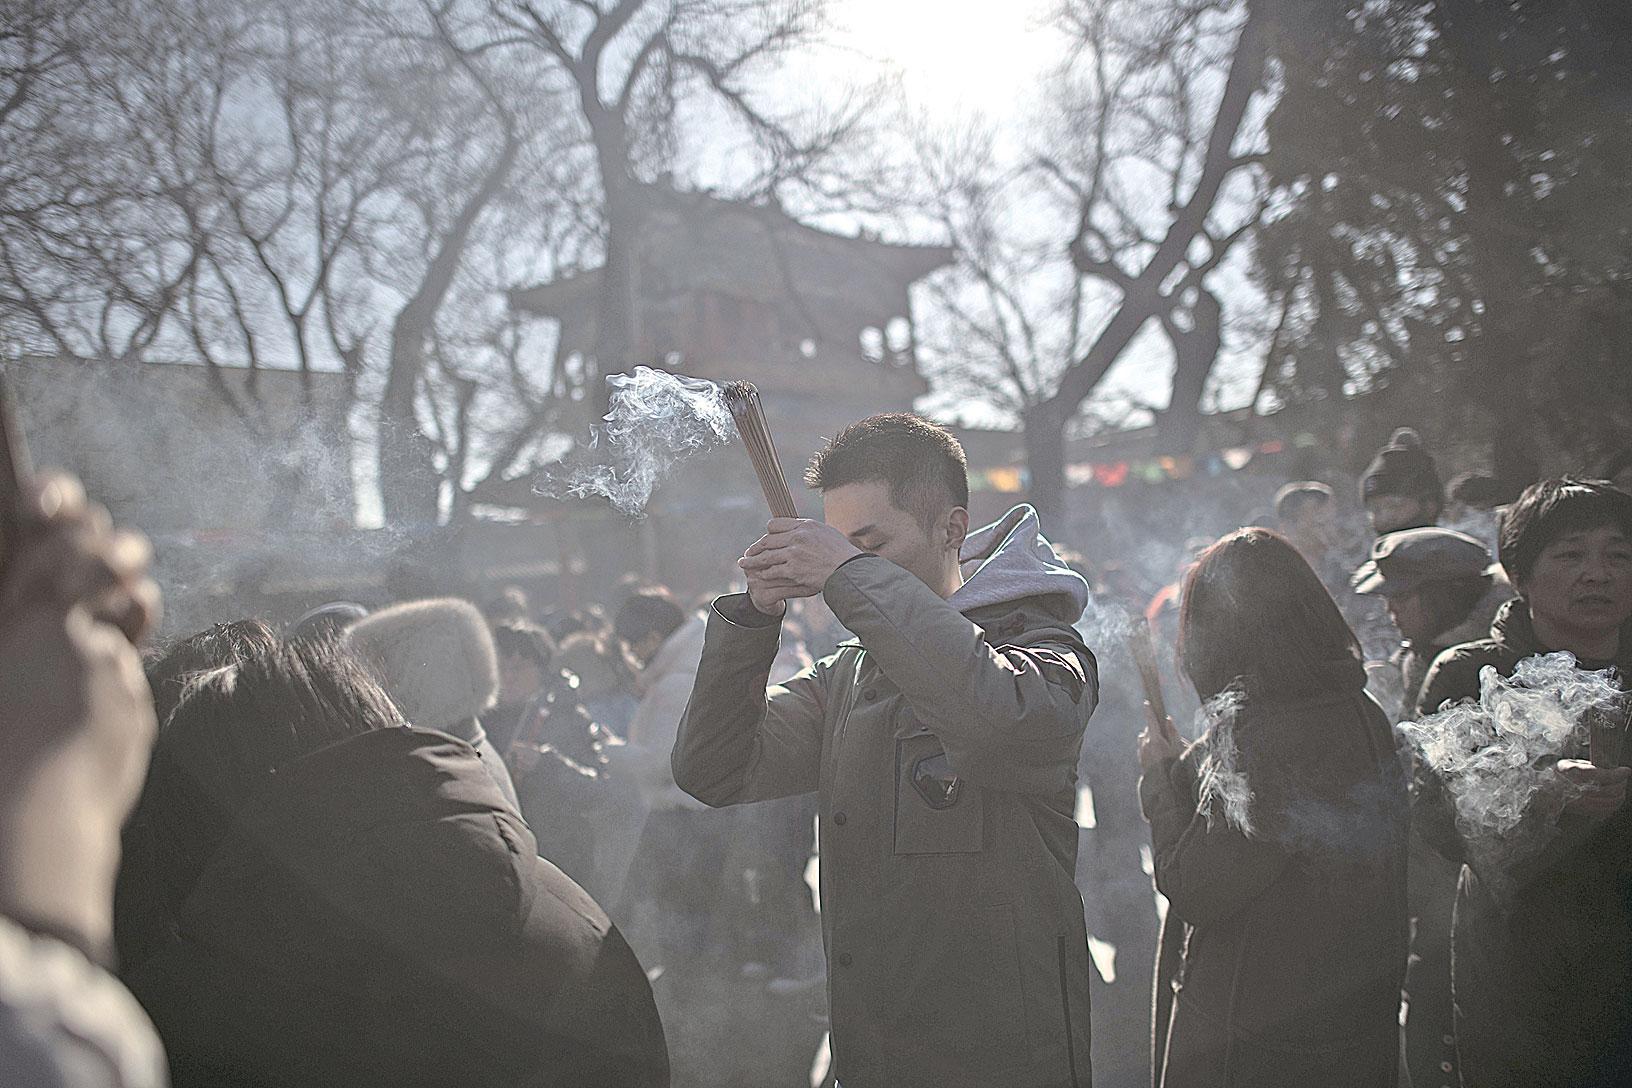 中共治下,宗教界早已烏煙瘴氣,淨土難覓。(NICOLAS ASFOURI/AFP/Getty Images)